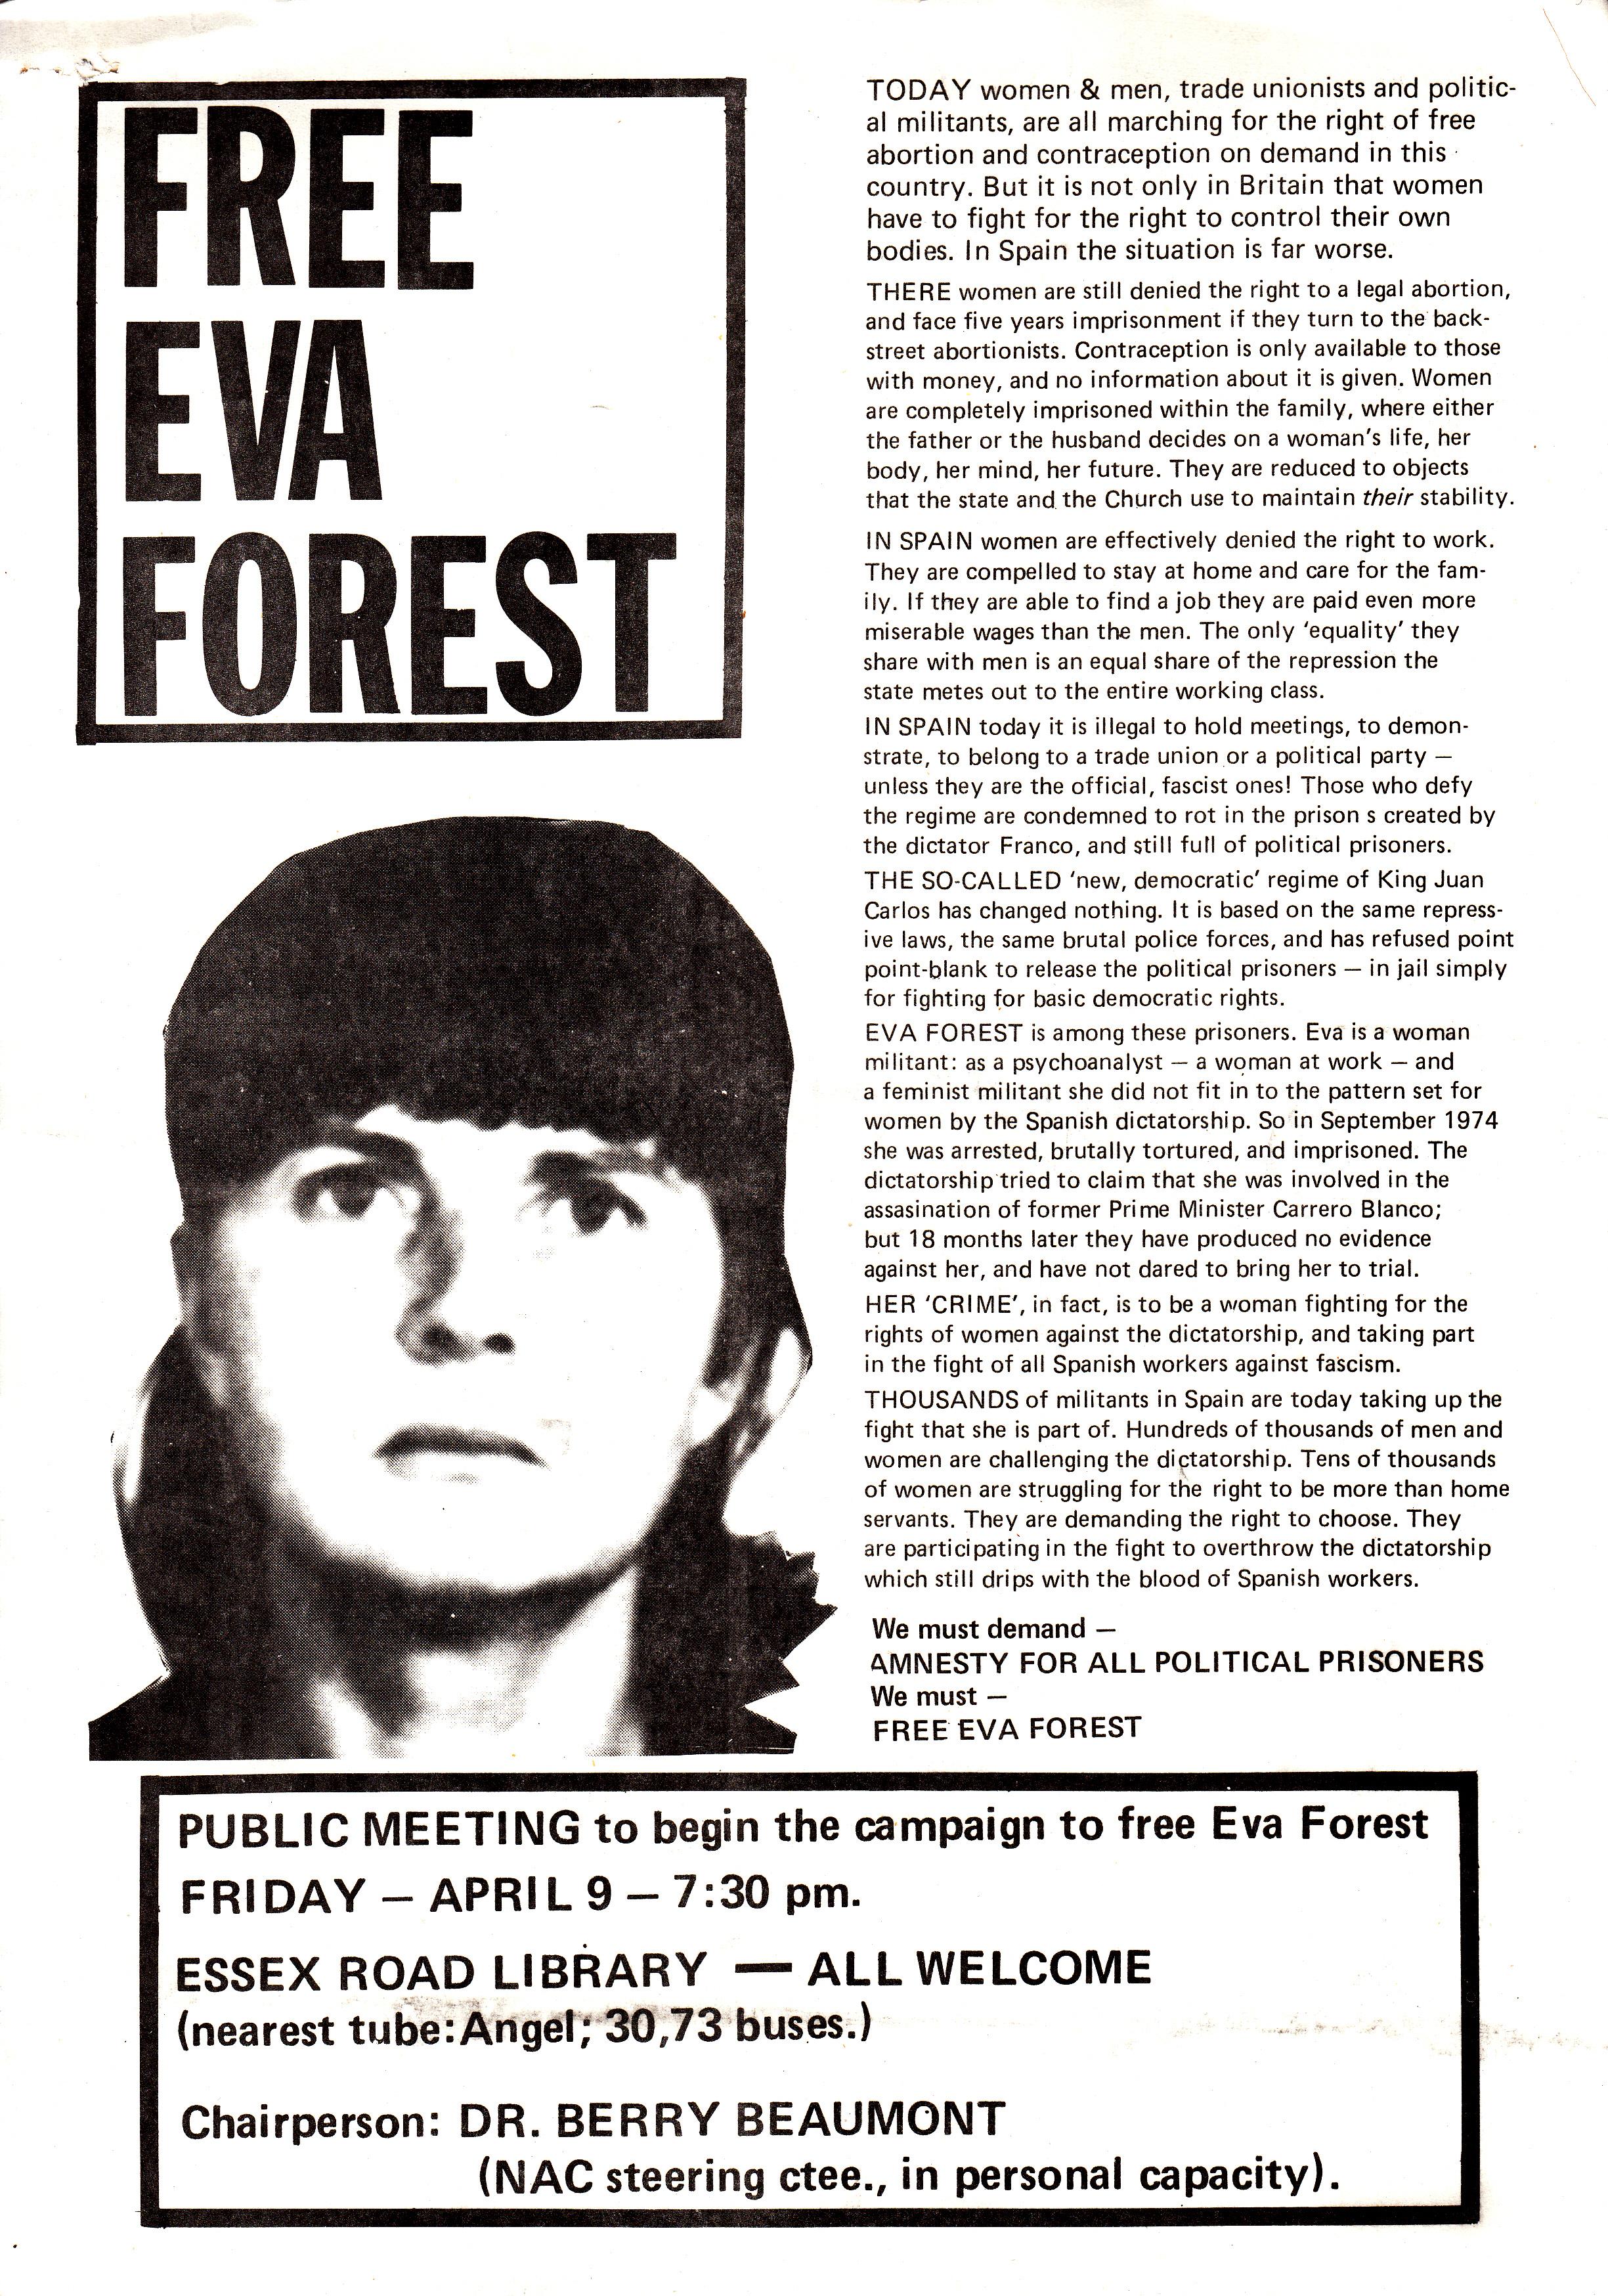 FREE EVA FOREST_0001